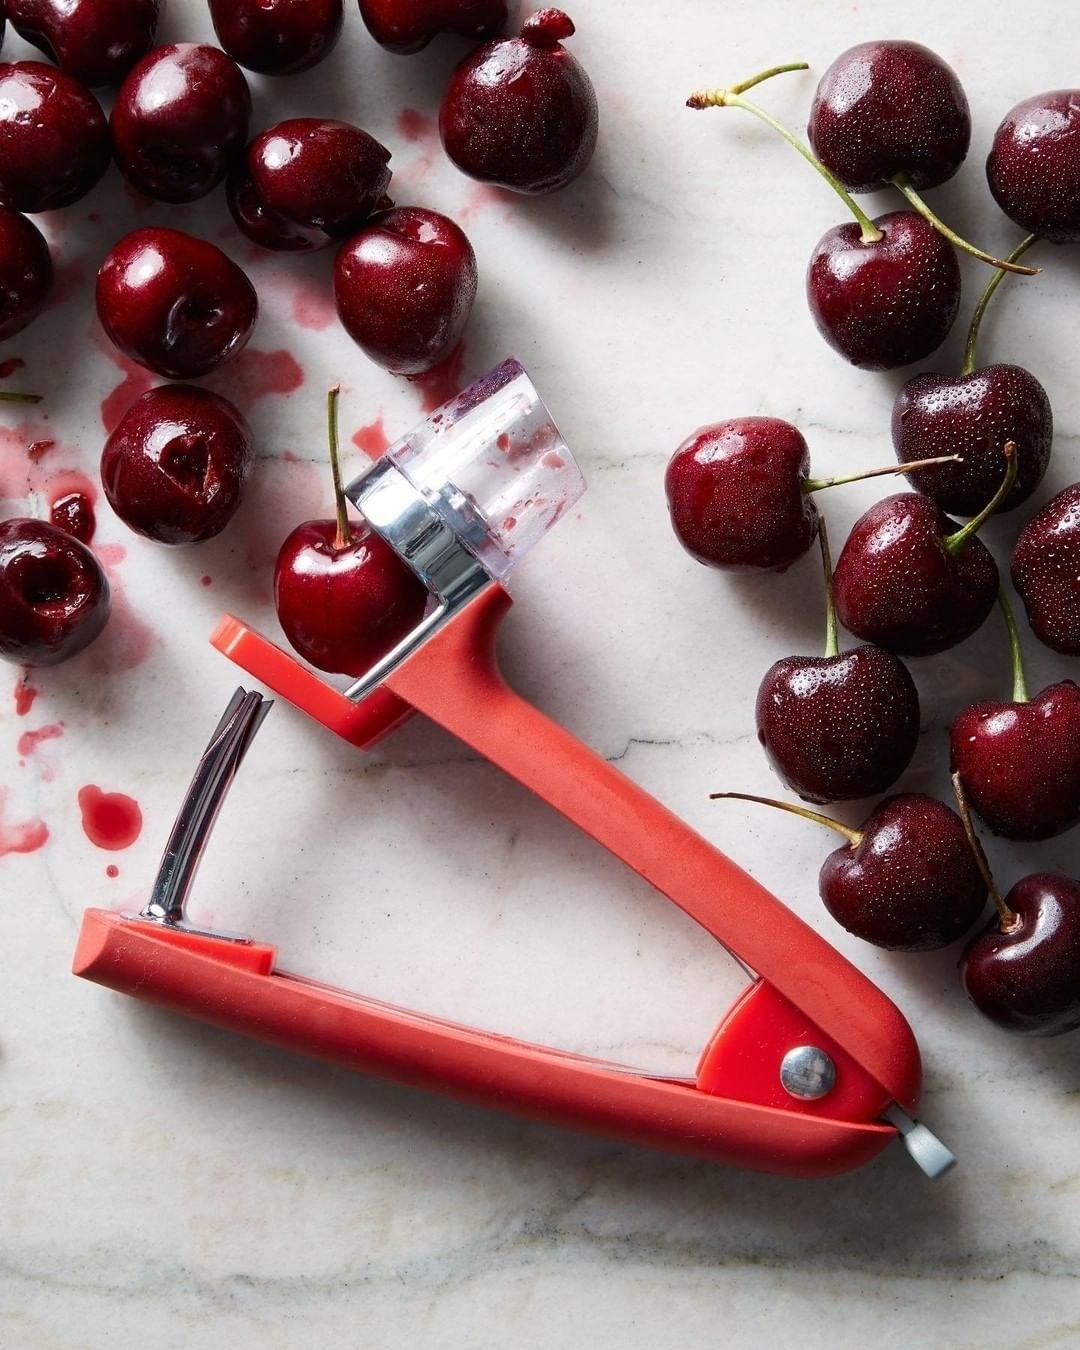 The cherry pitter